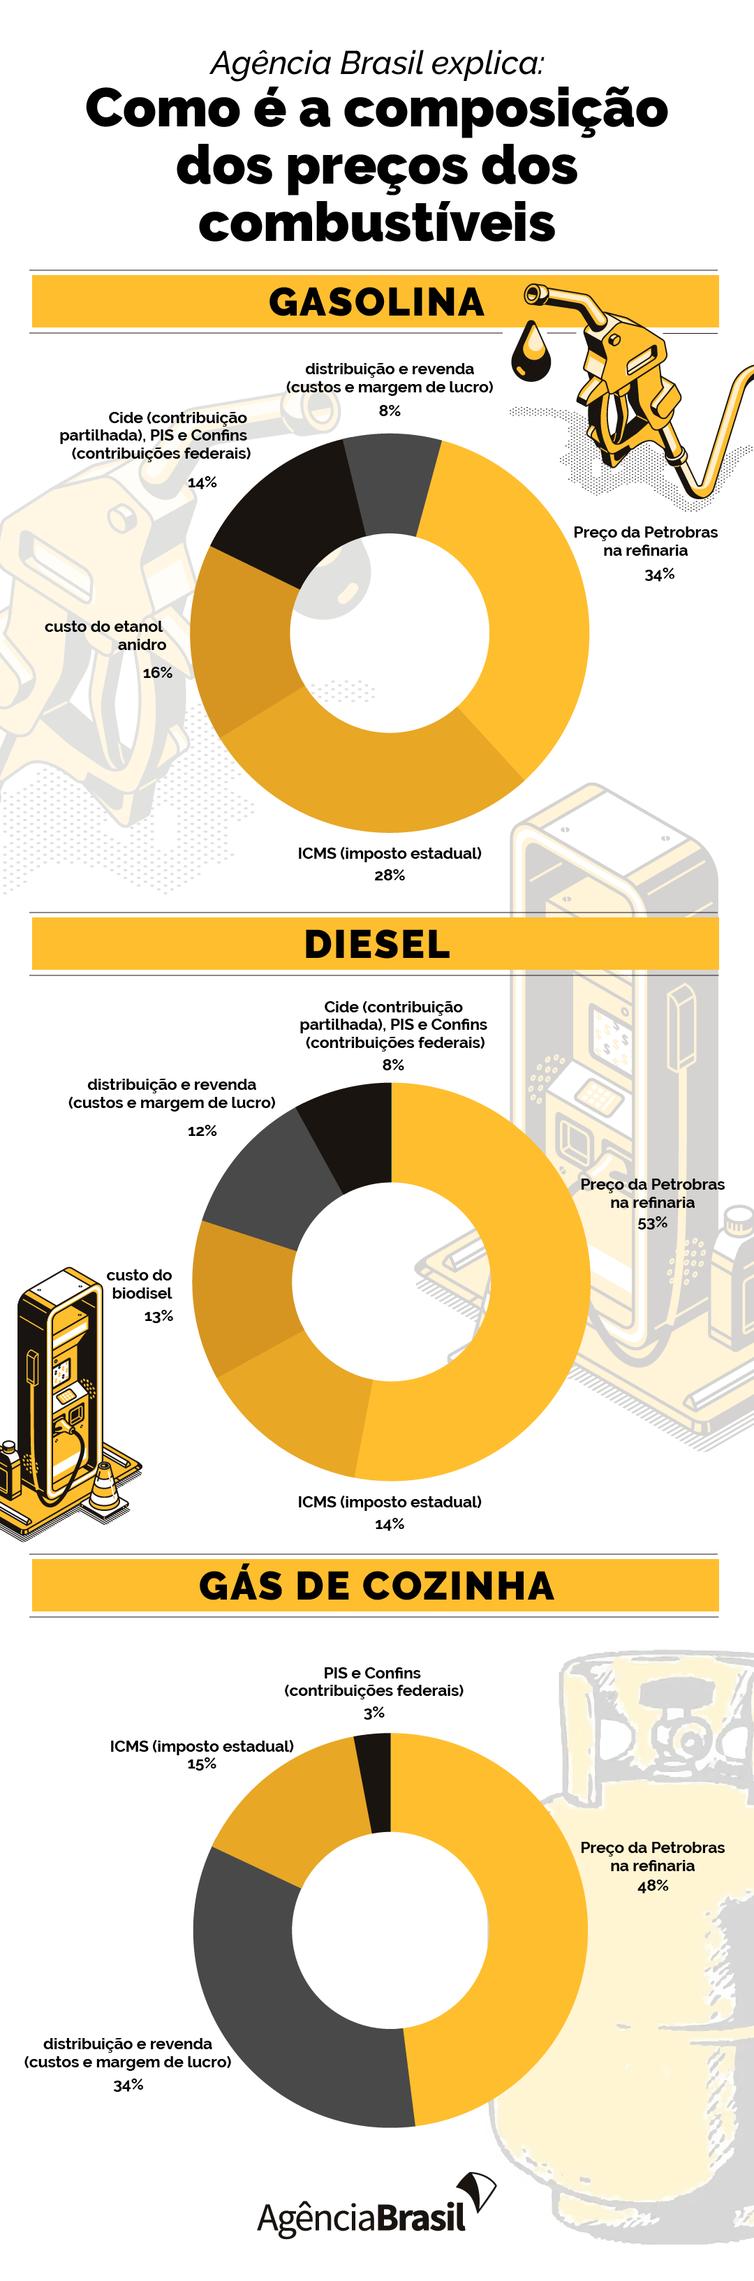 agencia-brasil-explica:-como-e-a-composicao-do-preco-dos-combustiveis